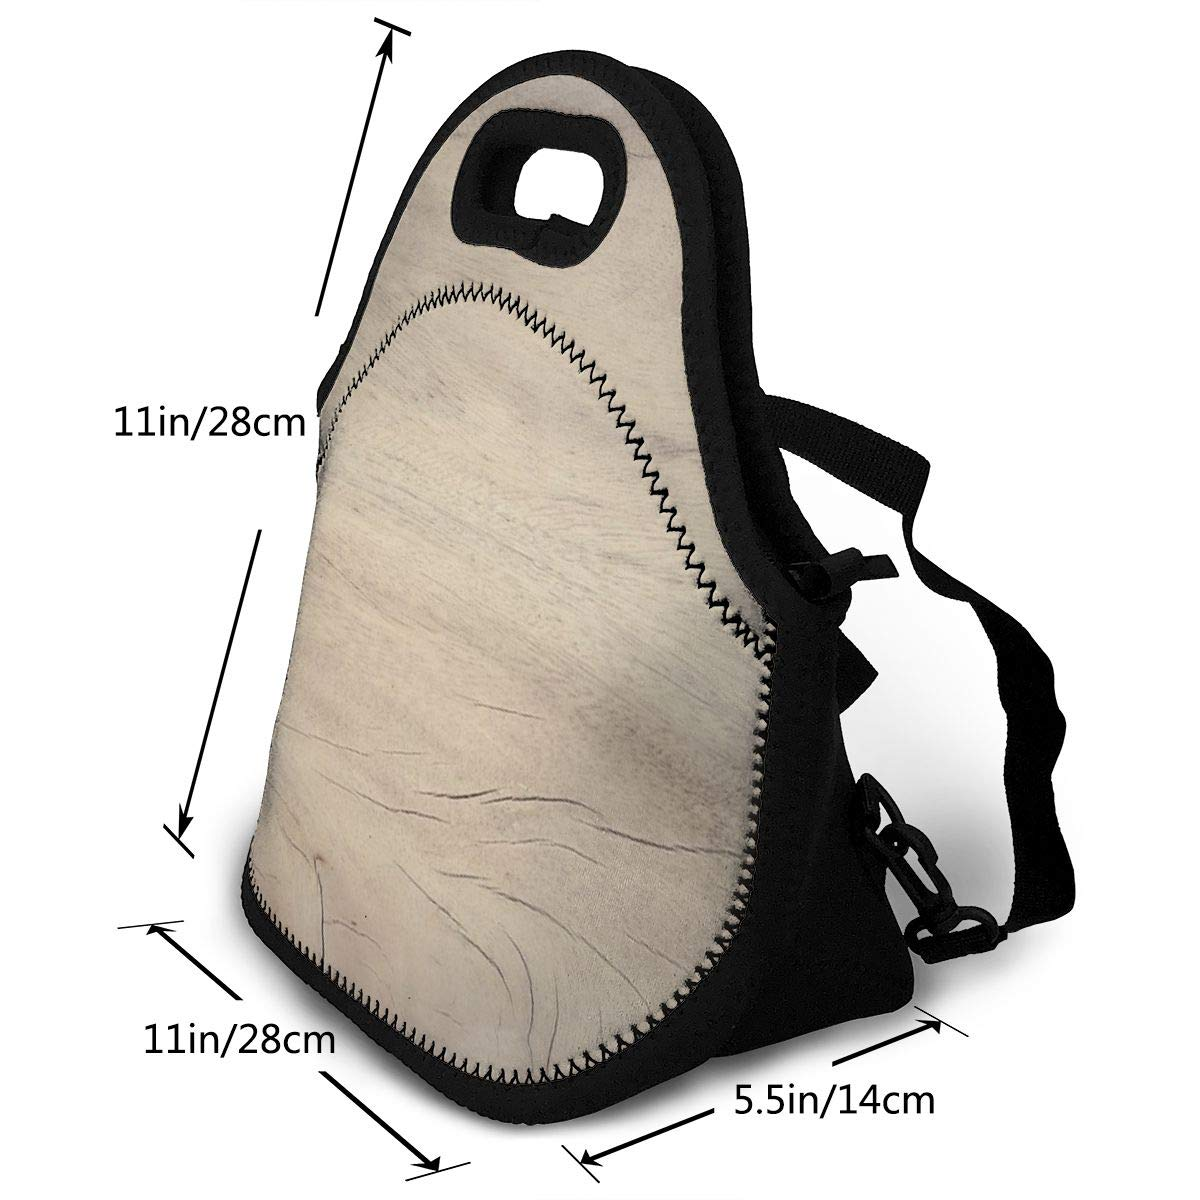 835ef3db3121 Amazon.com - Sanghing Wood Cute, Thermal, Insulation Lunch Bag ...